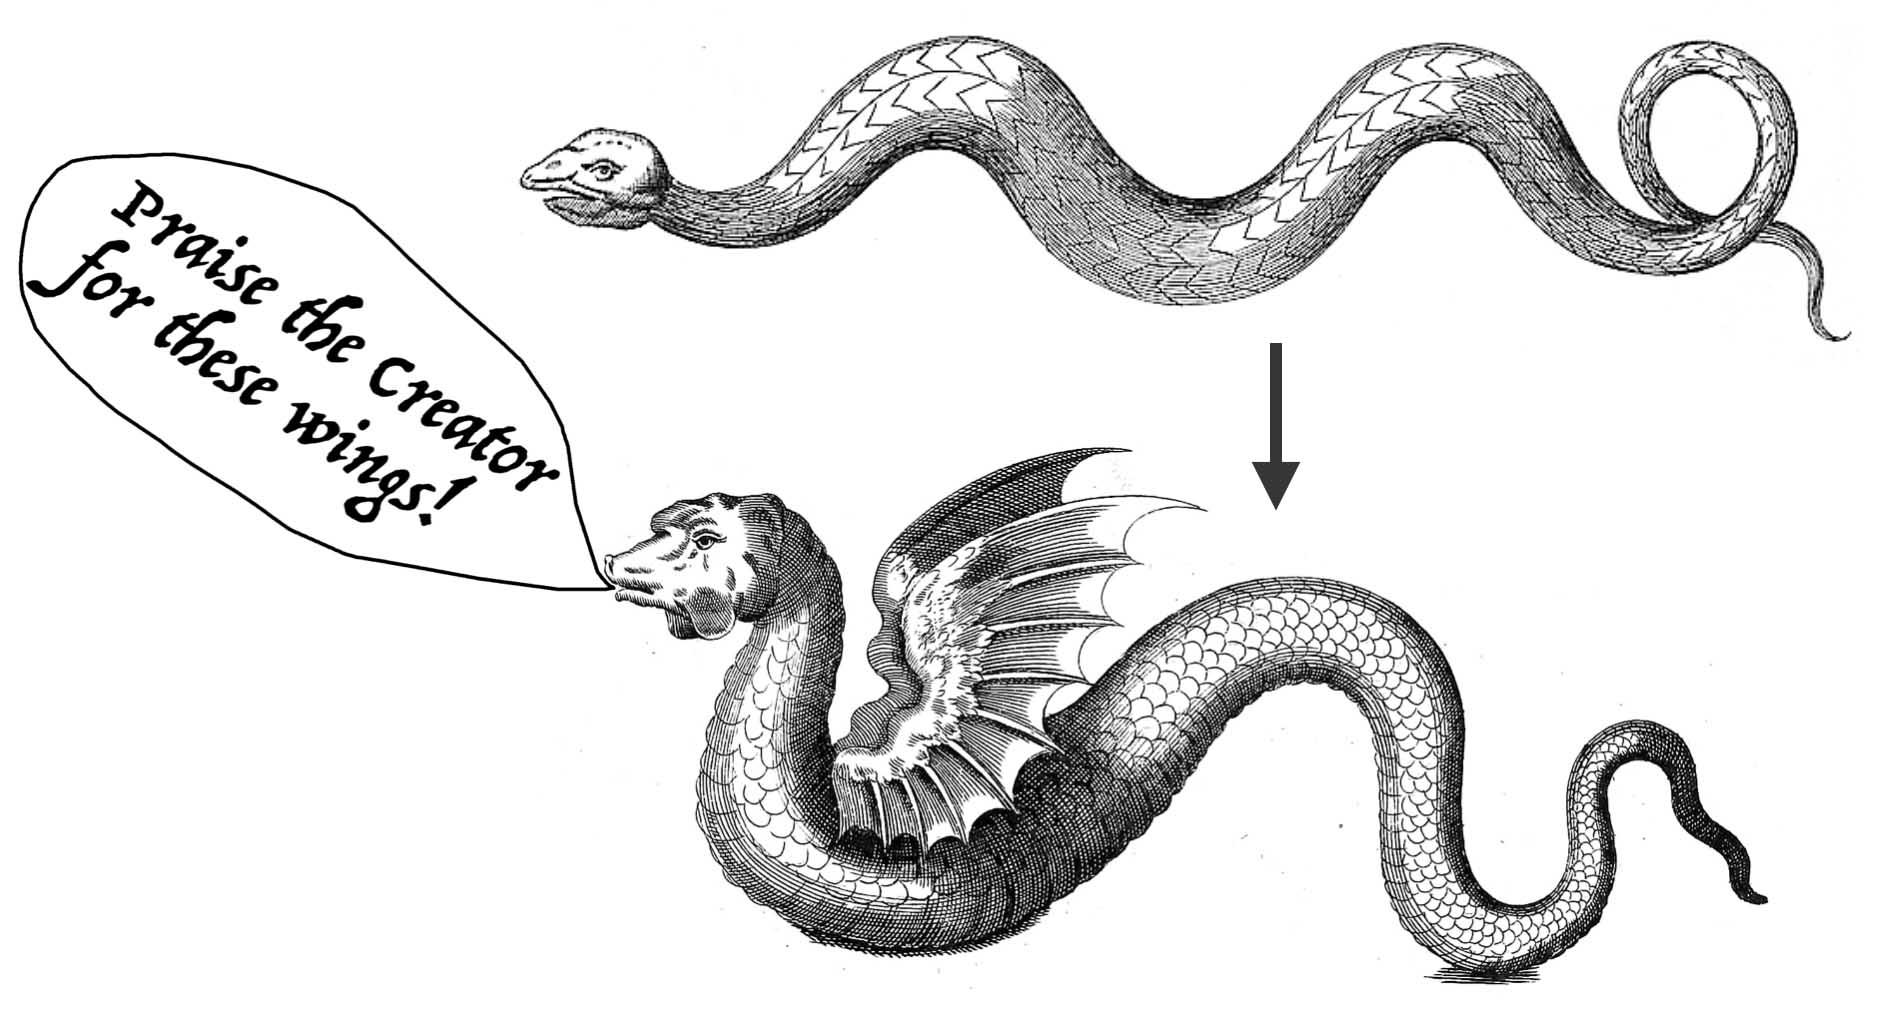 API Evolution the Right Way